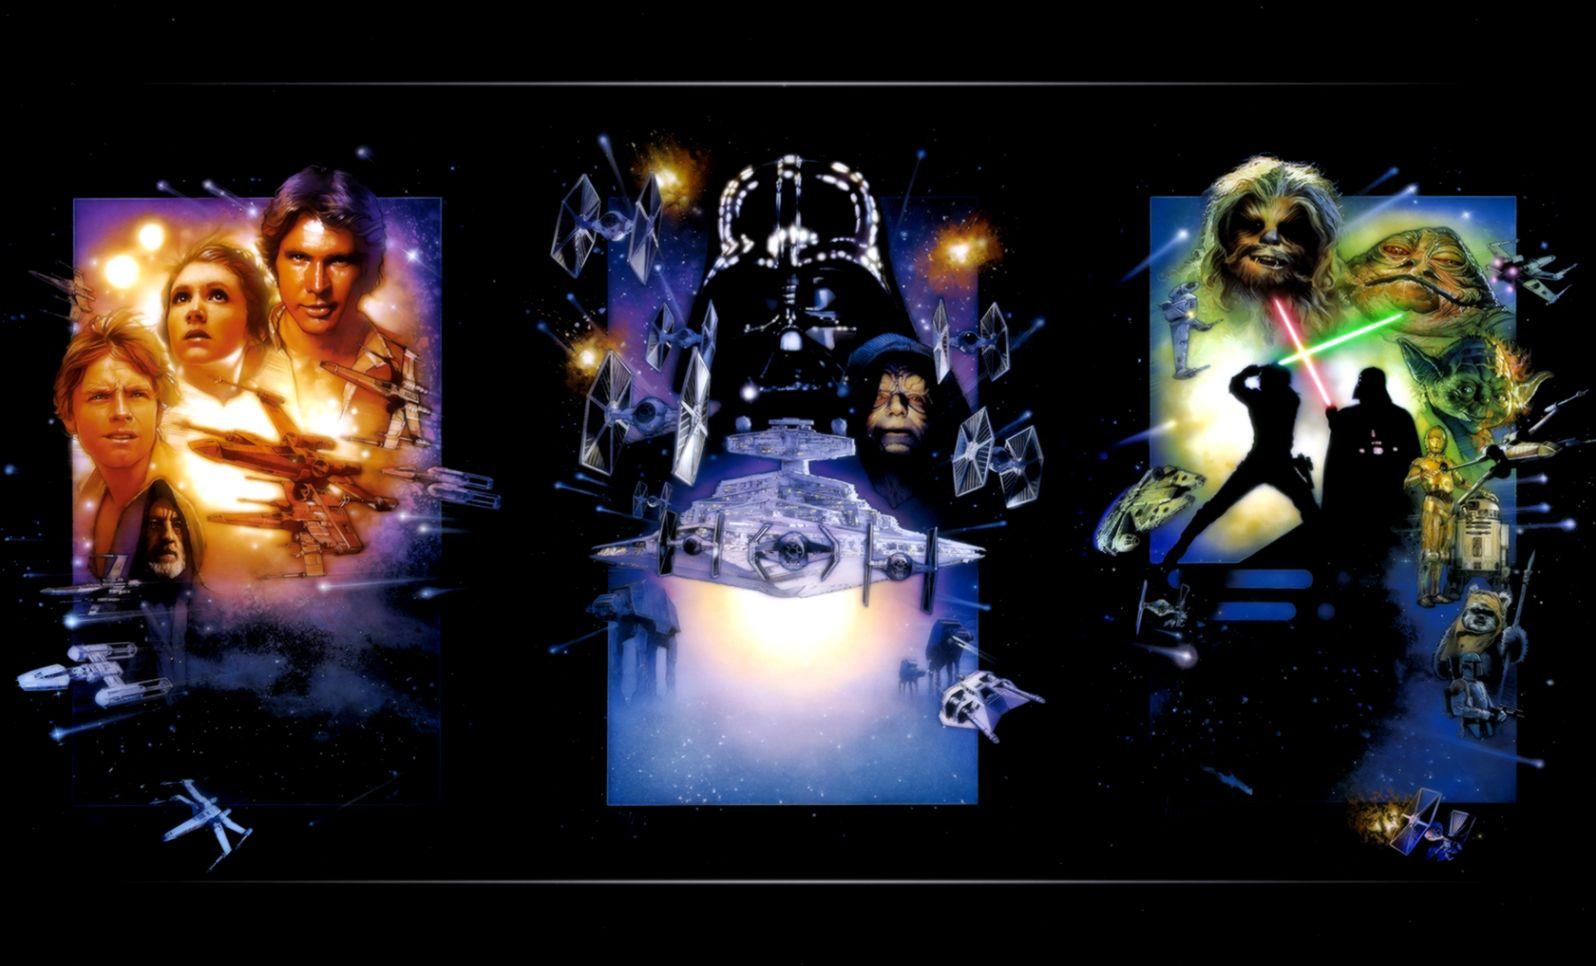 164 1645468 the star wars trilogy computer wallpapers desktop backgrounds